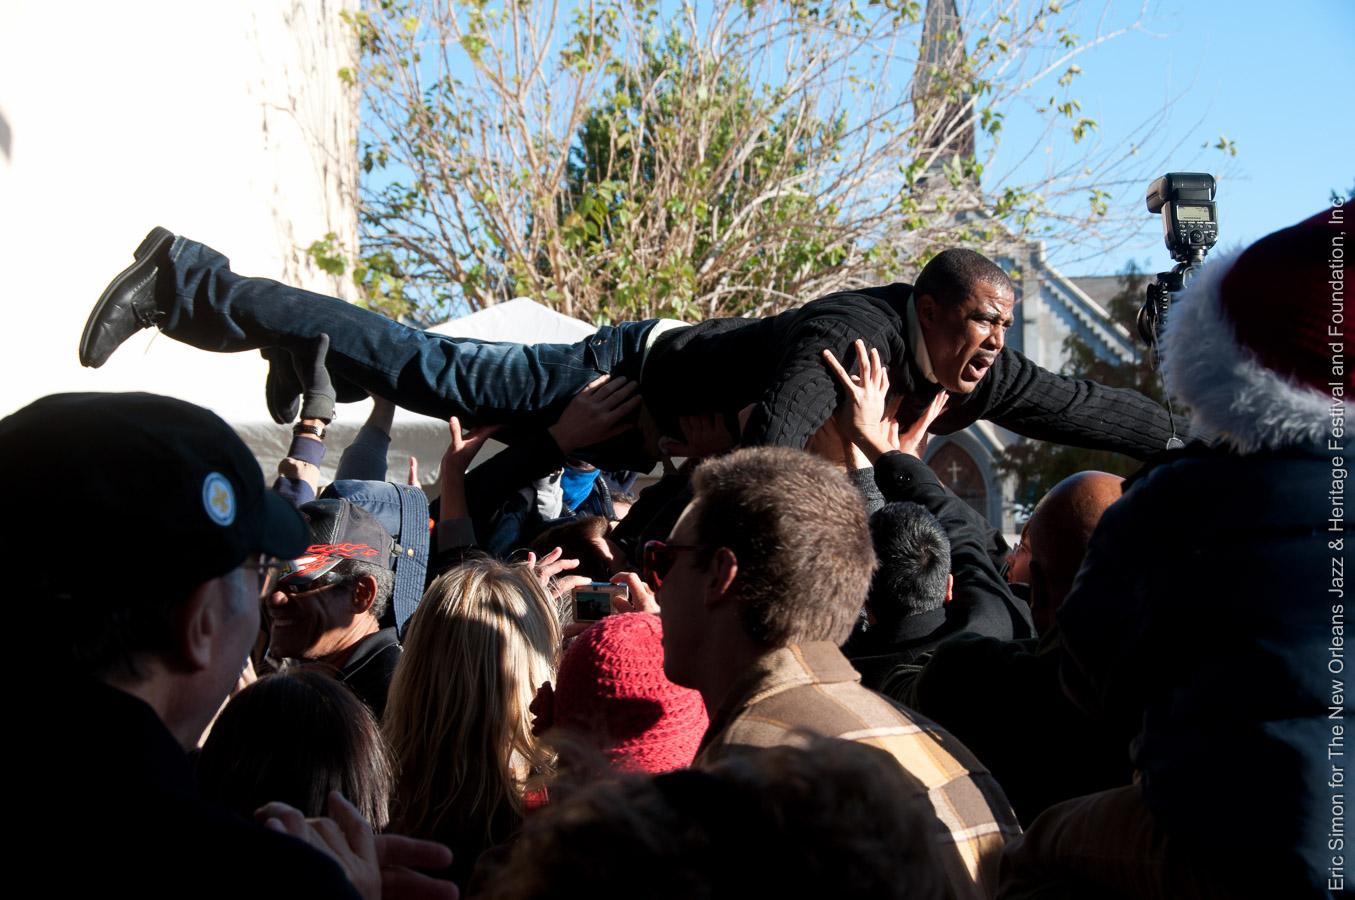 Glen David Andrews, Music, New Orleans, Third Annual Treme Creole Gumbo Festival 2010